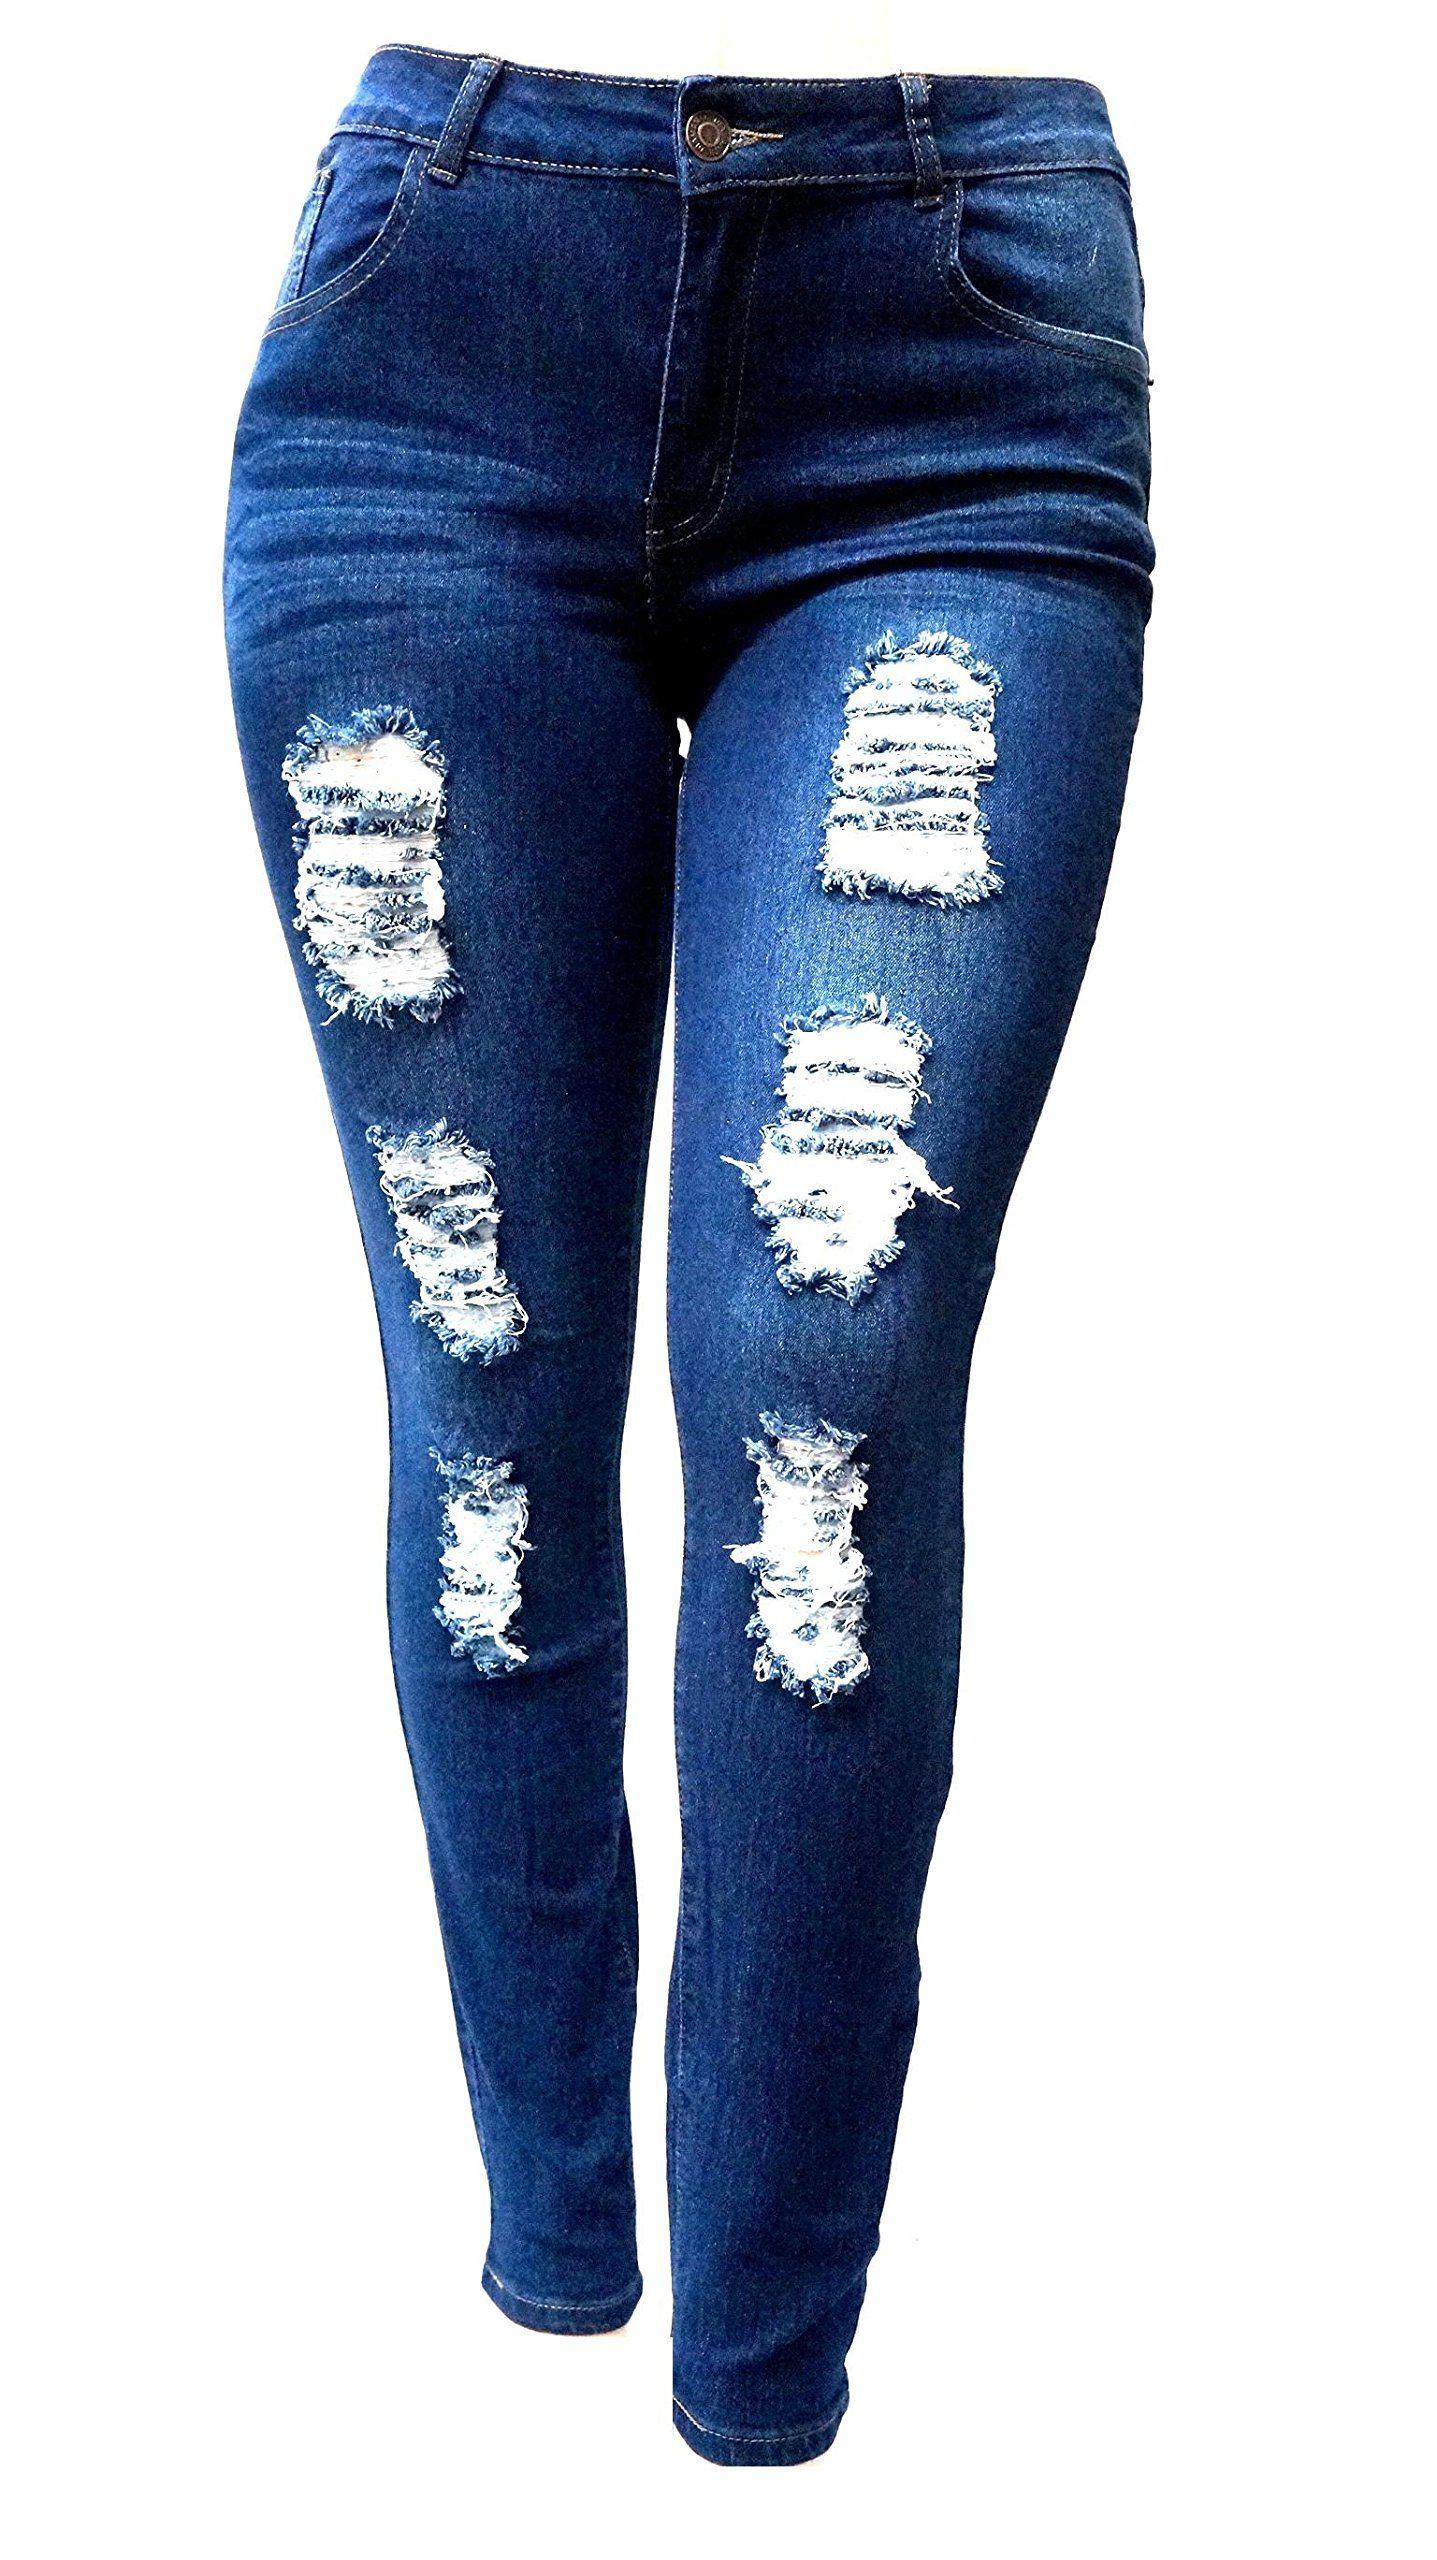 SL 1826 WOMENS PLUS SIZE Stretch Distressed Ripped BLUE SKINNY DENIM JEANS  PANTS (18) b5b06afc1